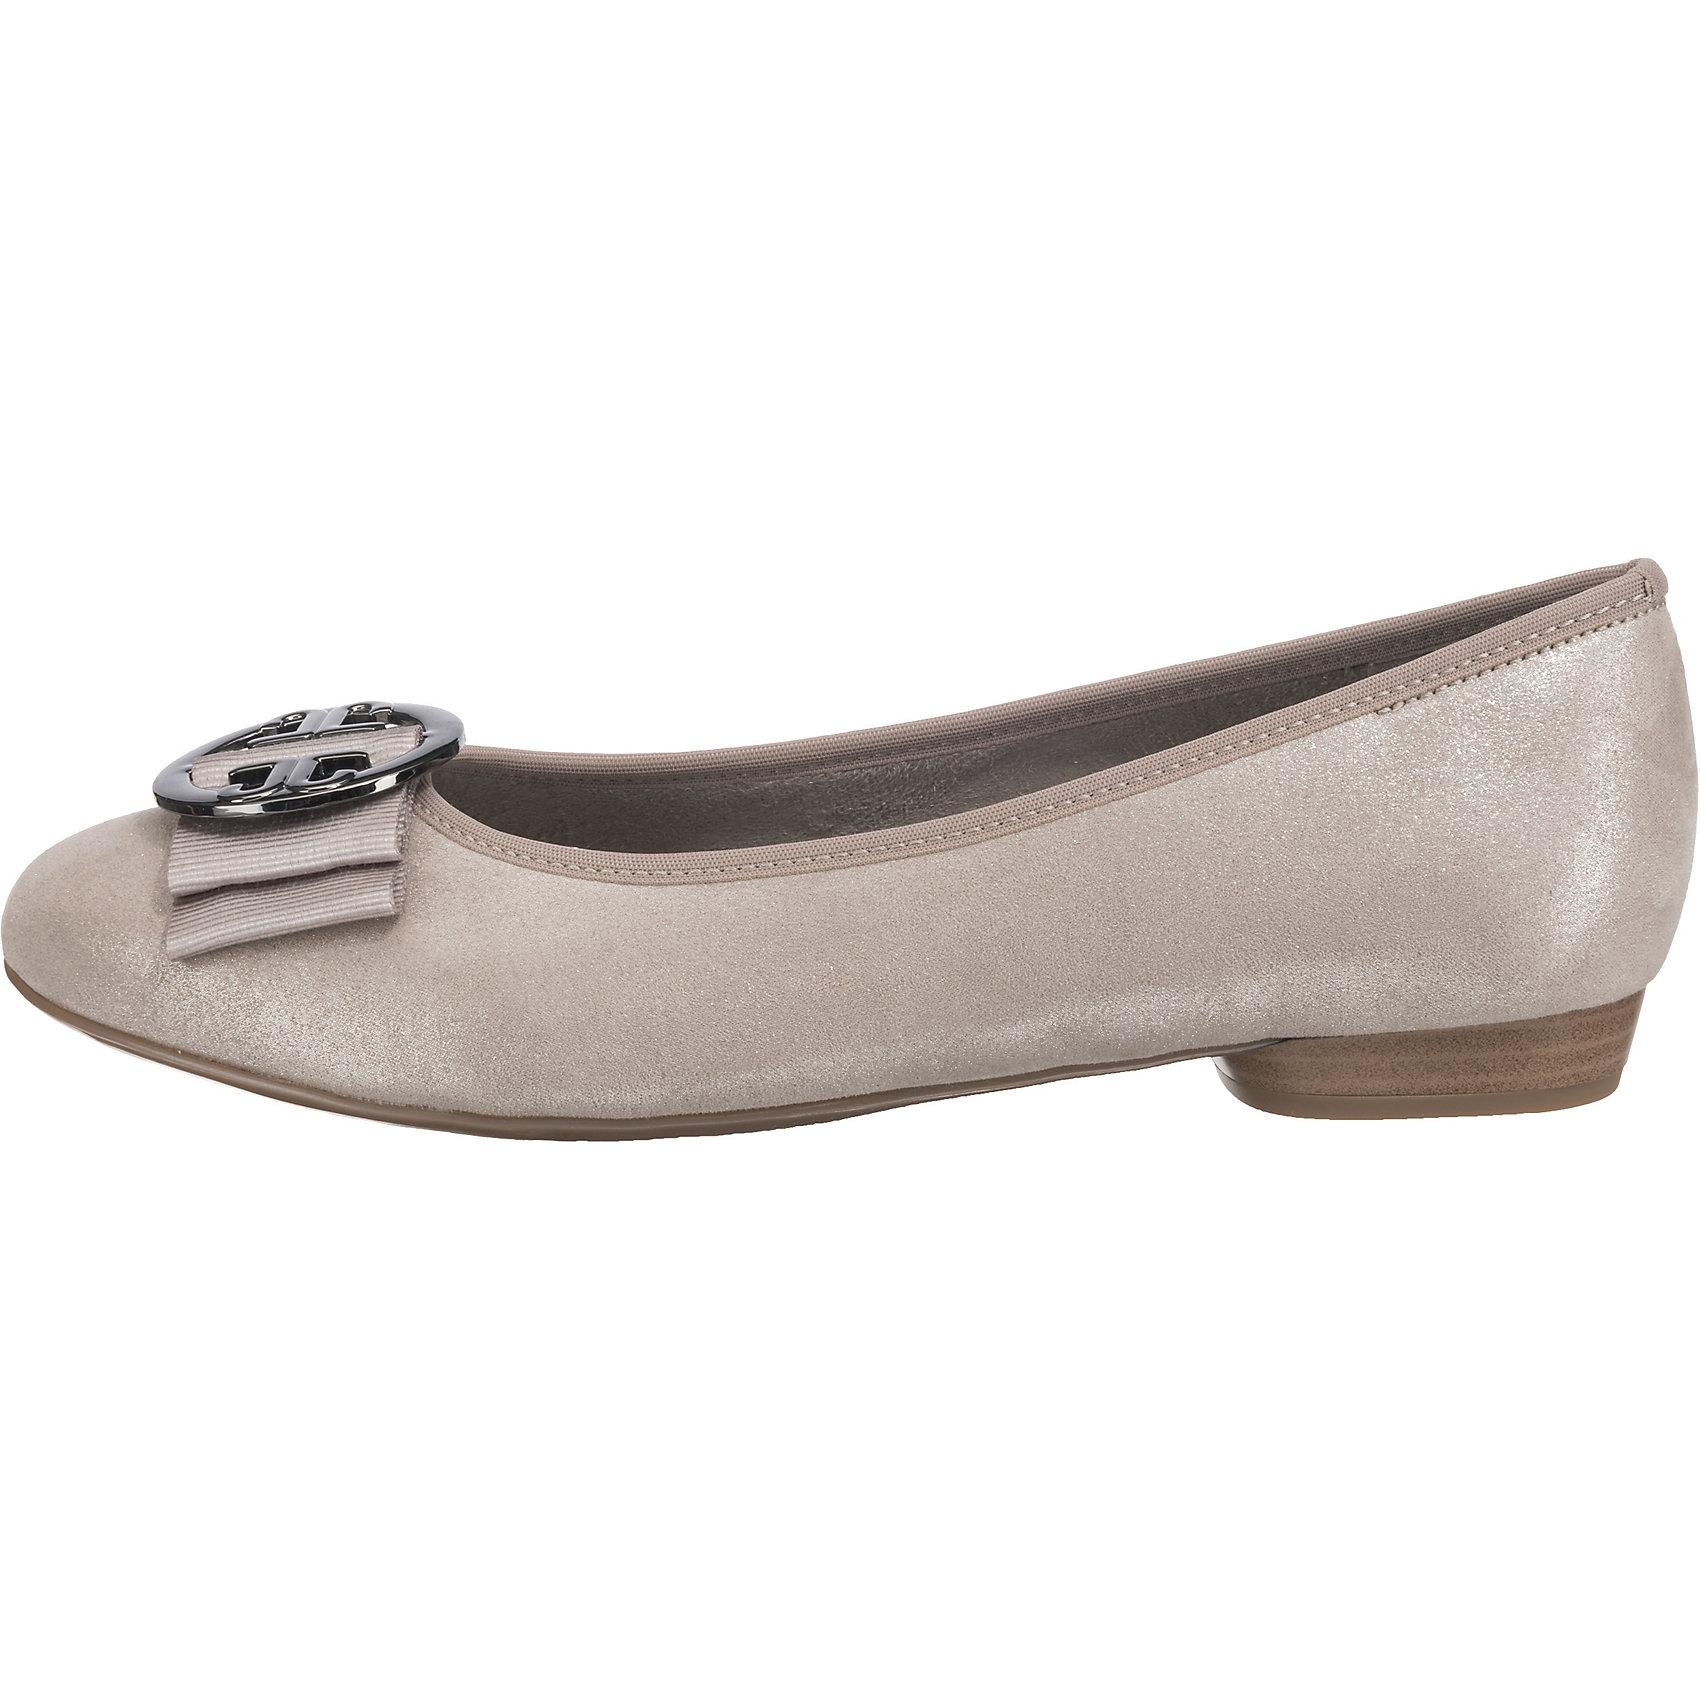 Neu JENNY Pisa Klassische Ballerinas 7389947 für Damen grau